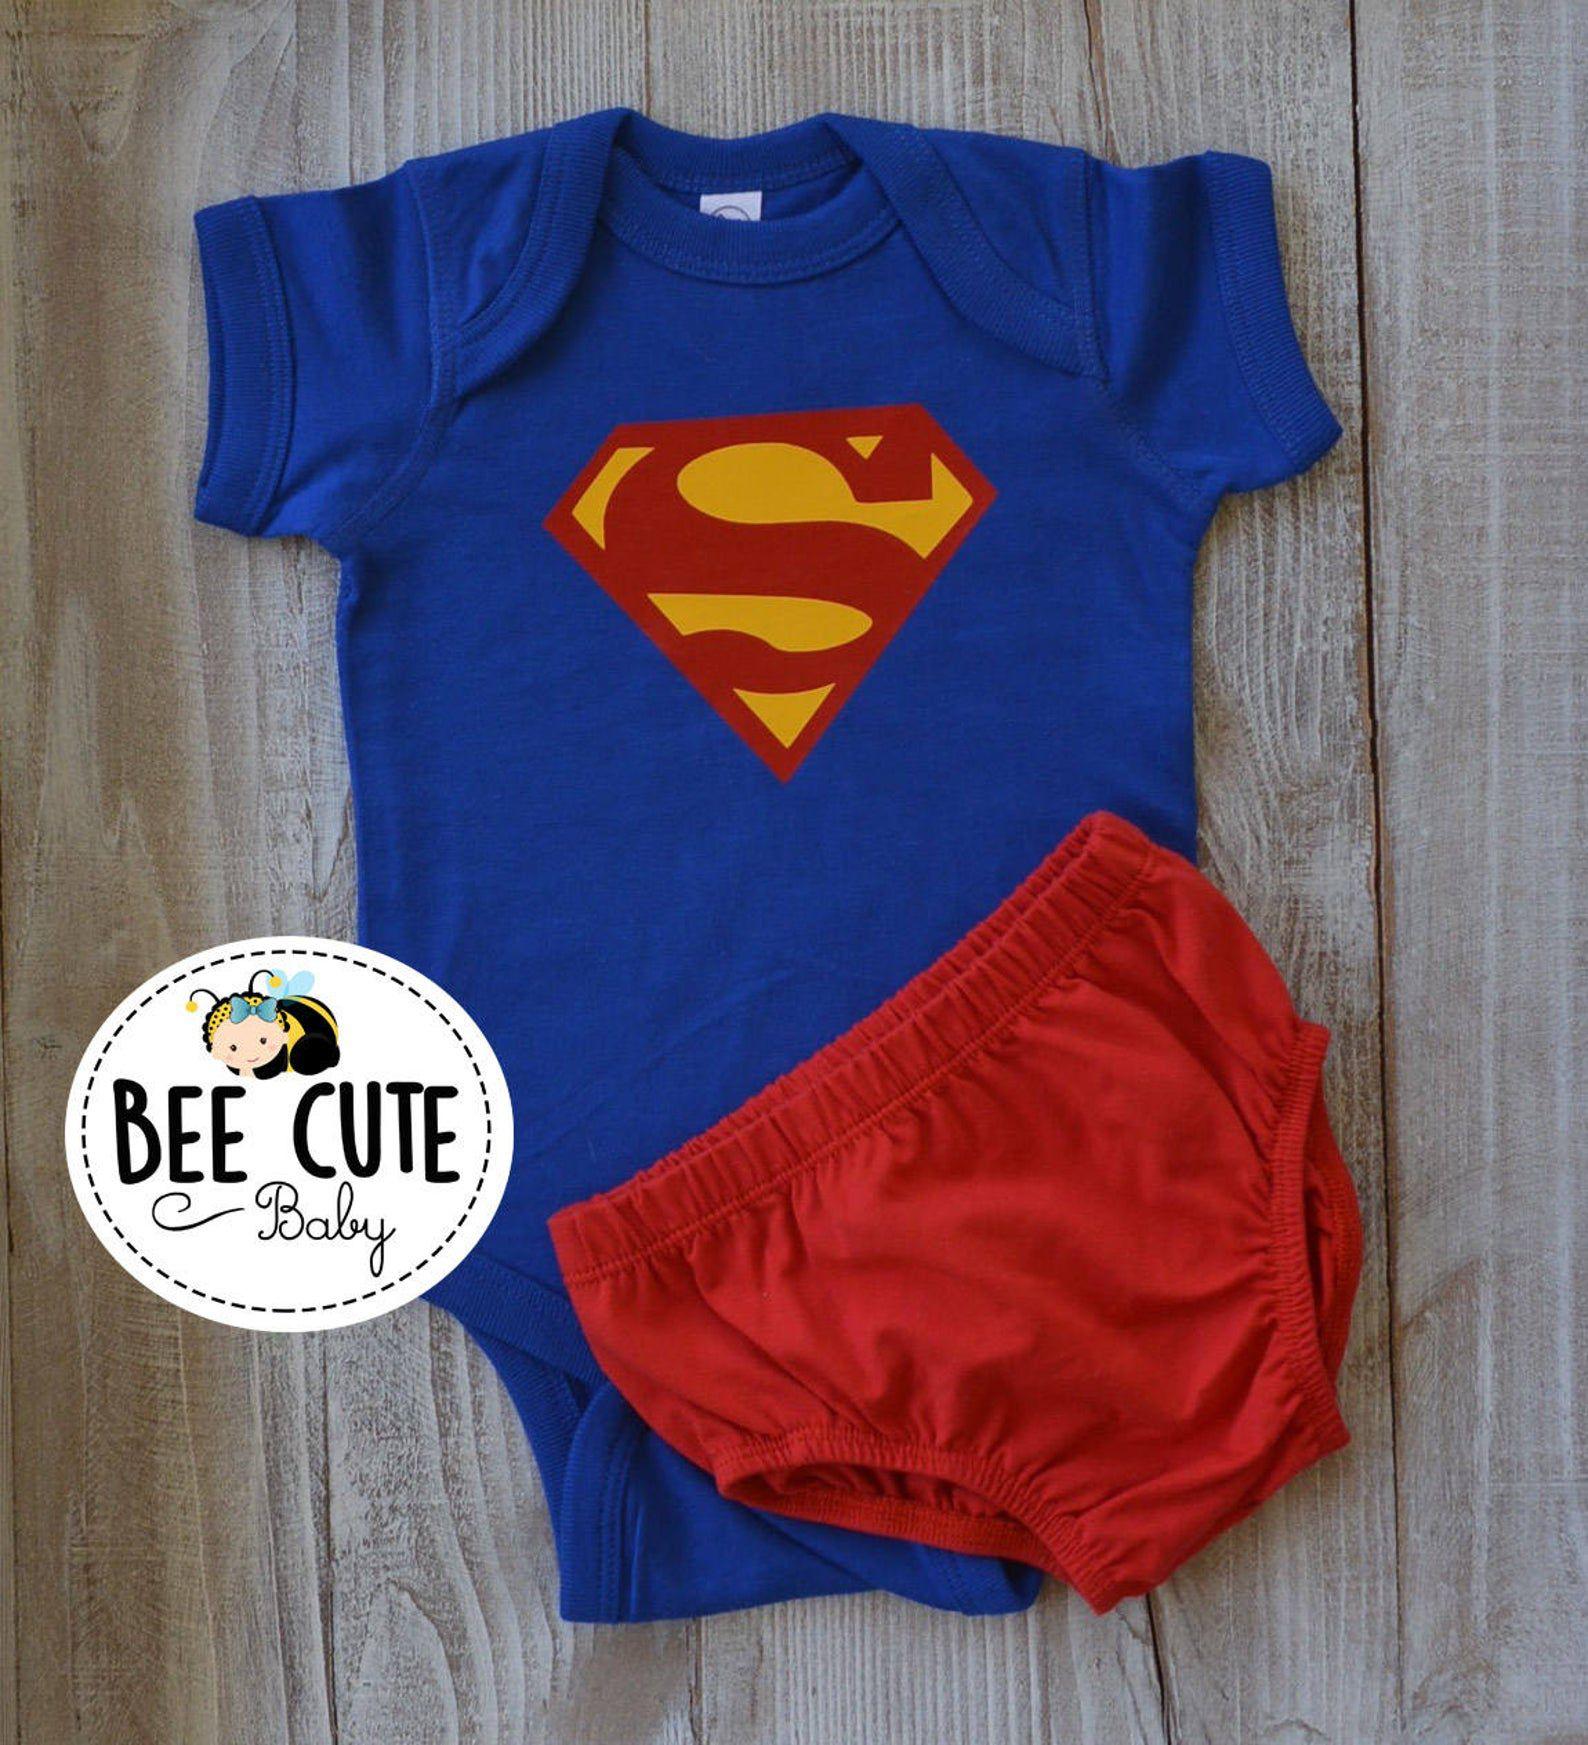 Image of Superman costume.